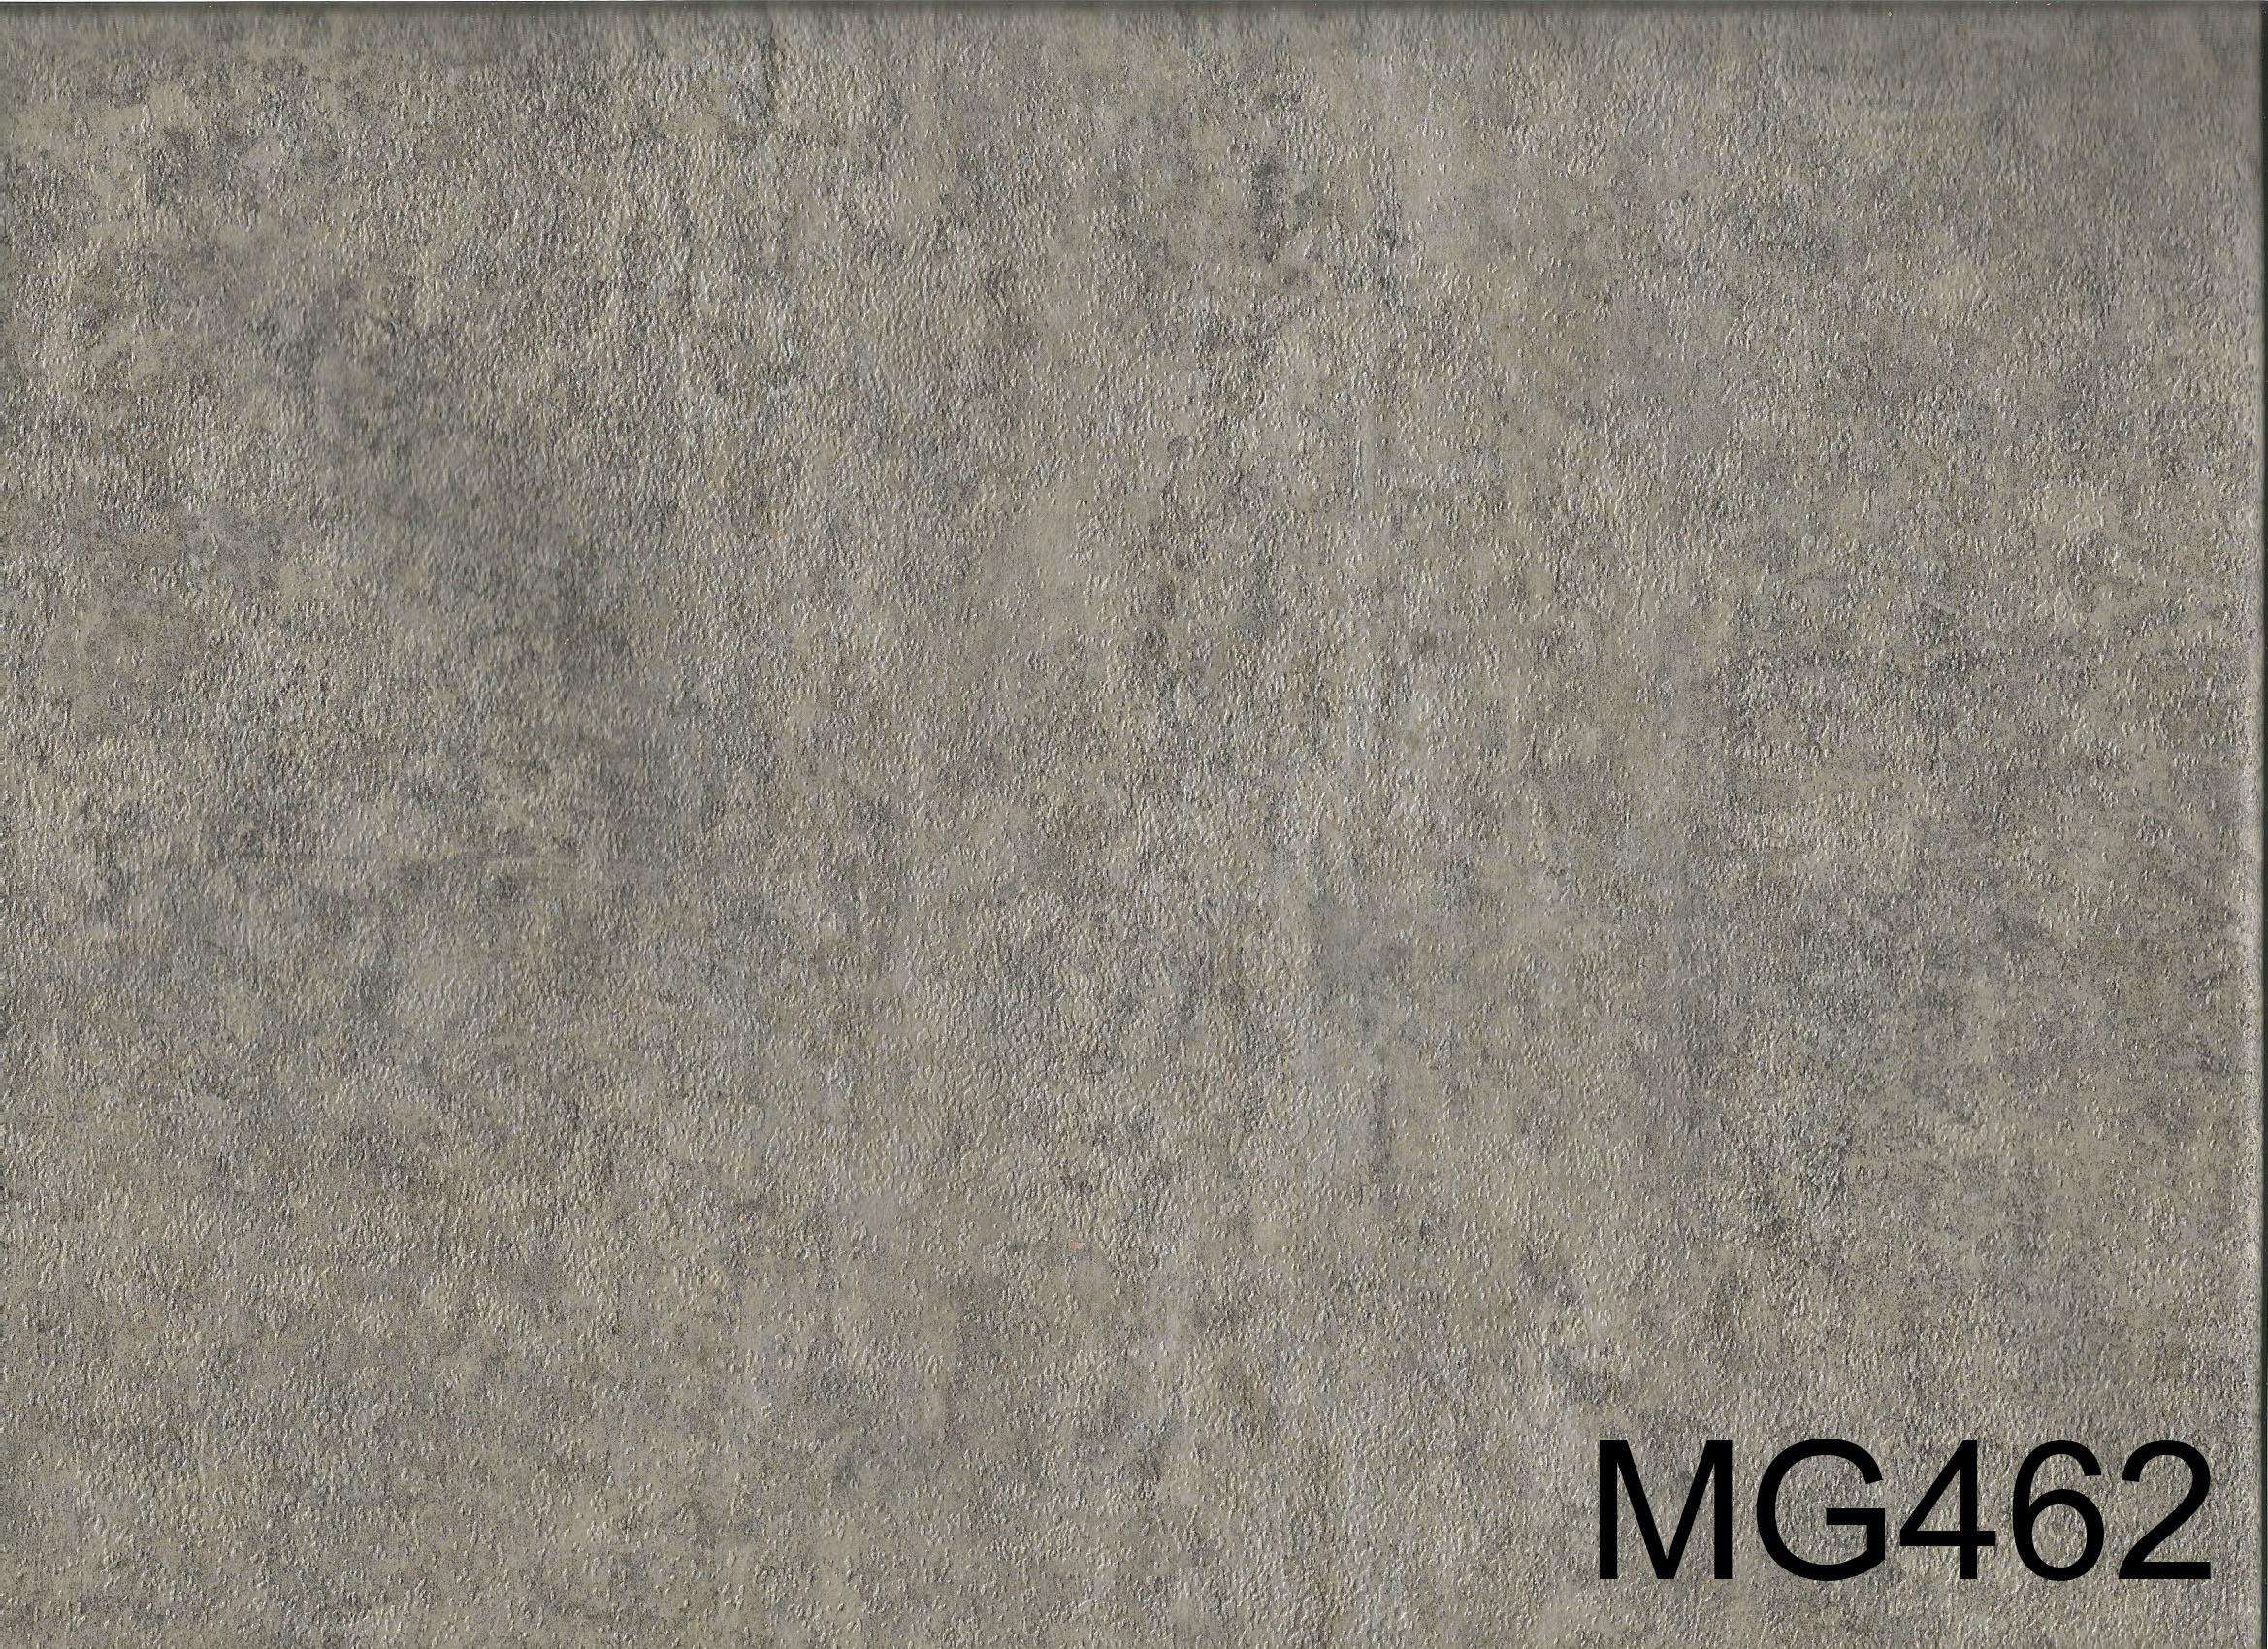 MG462